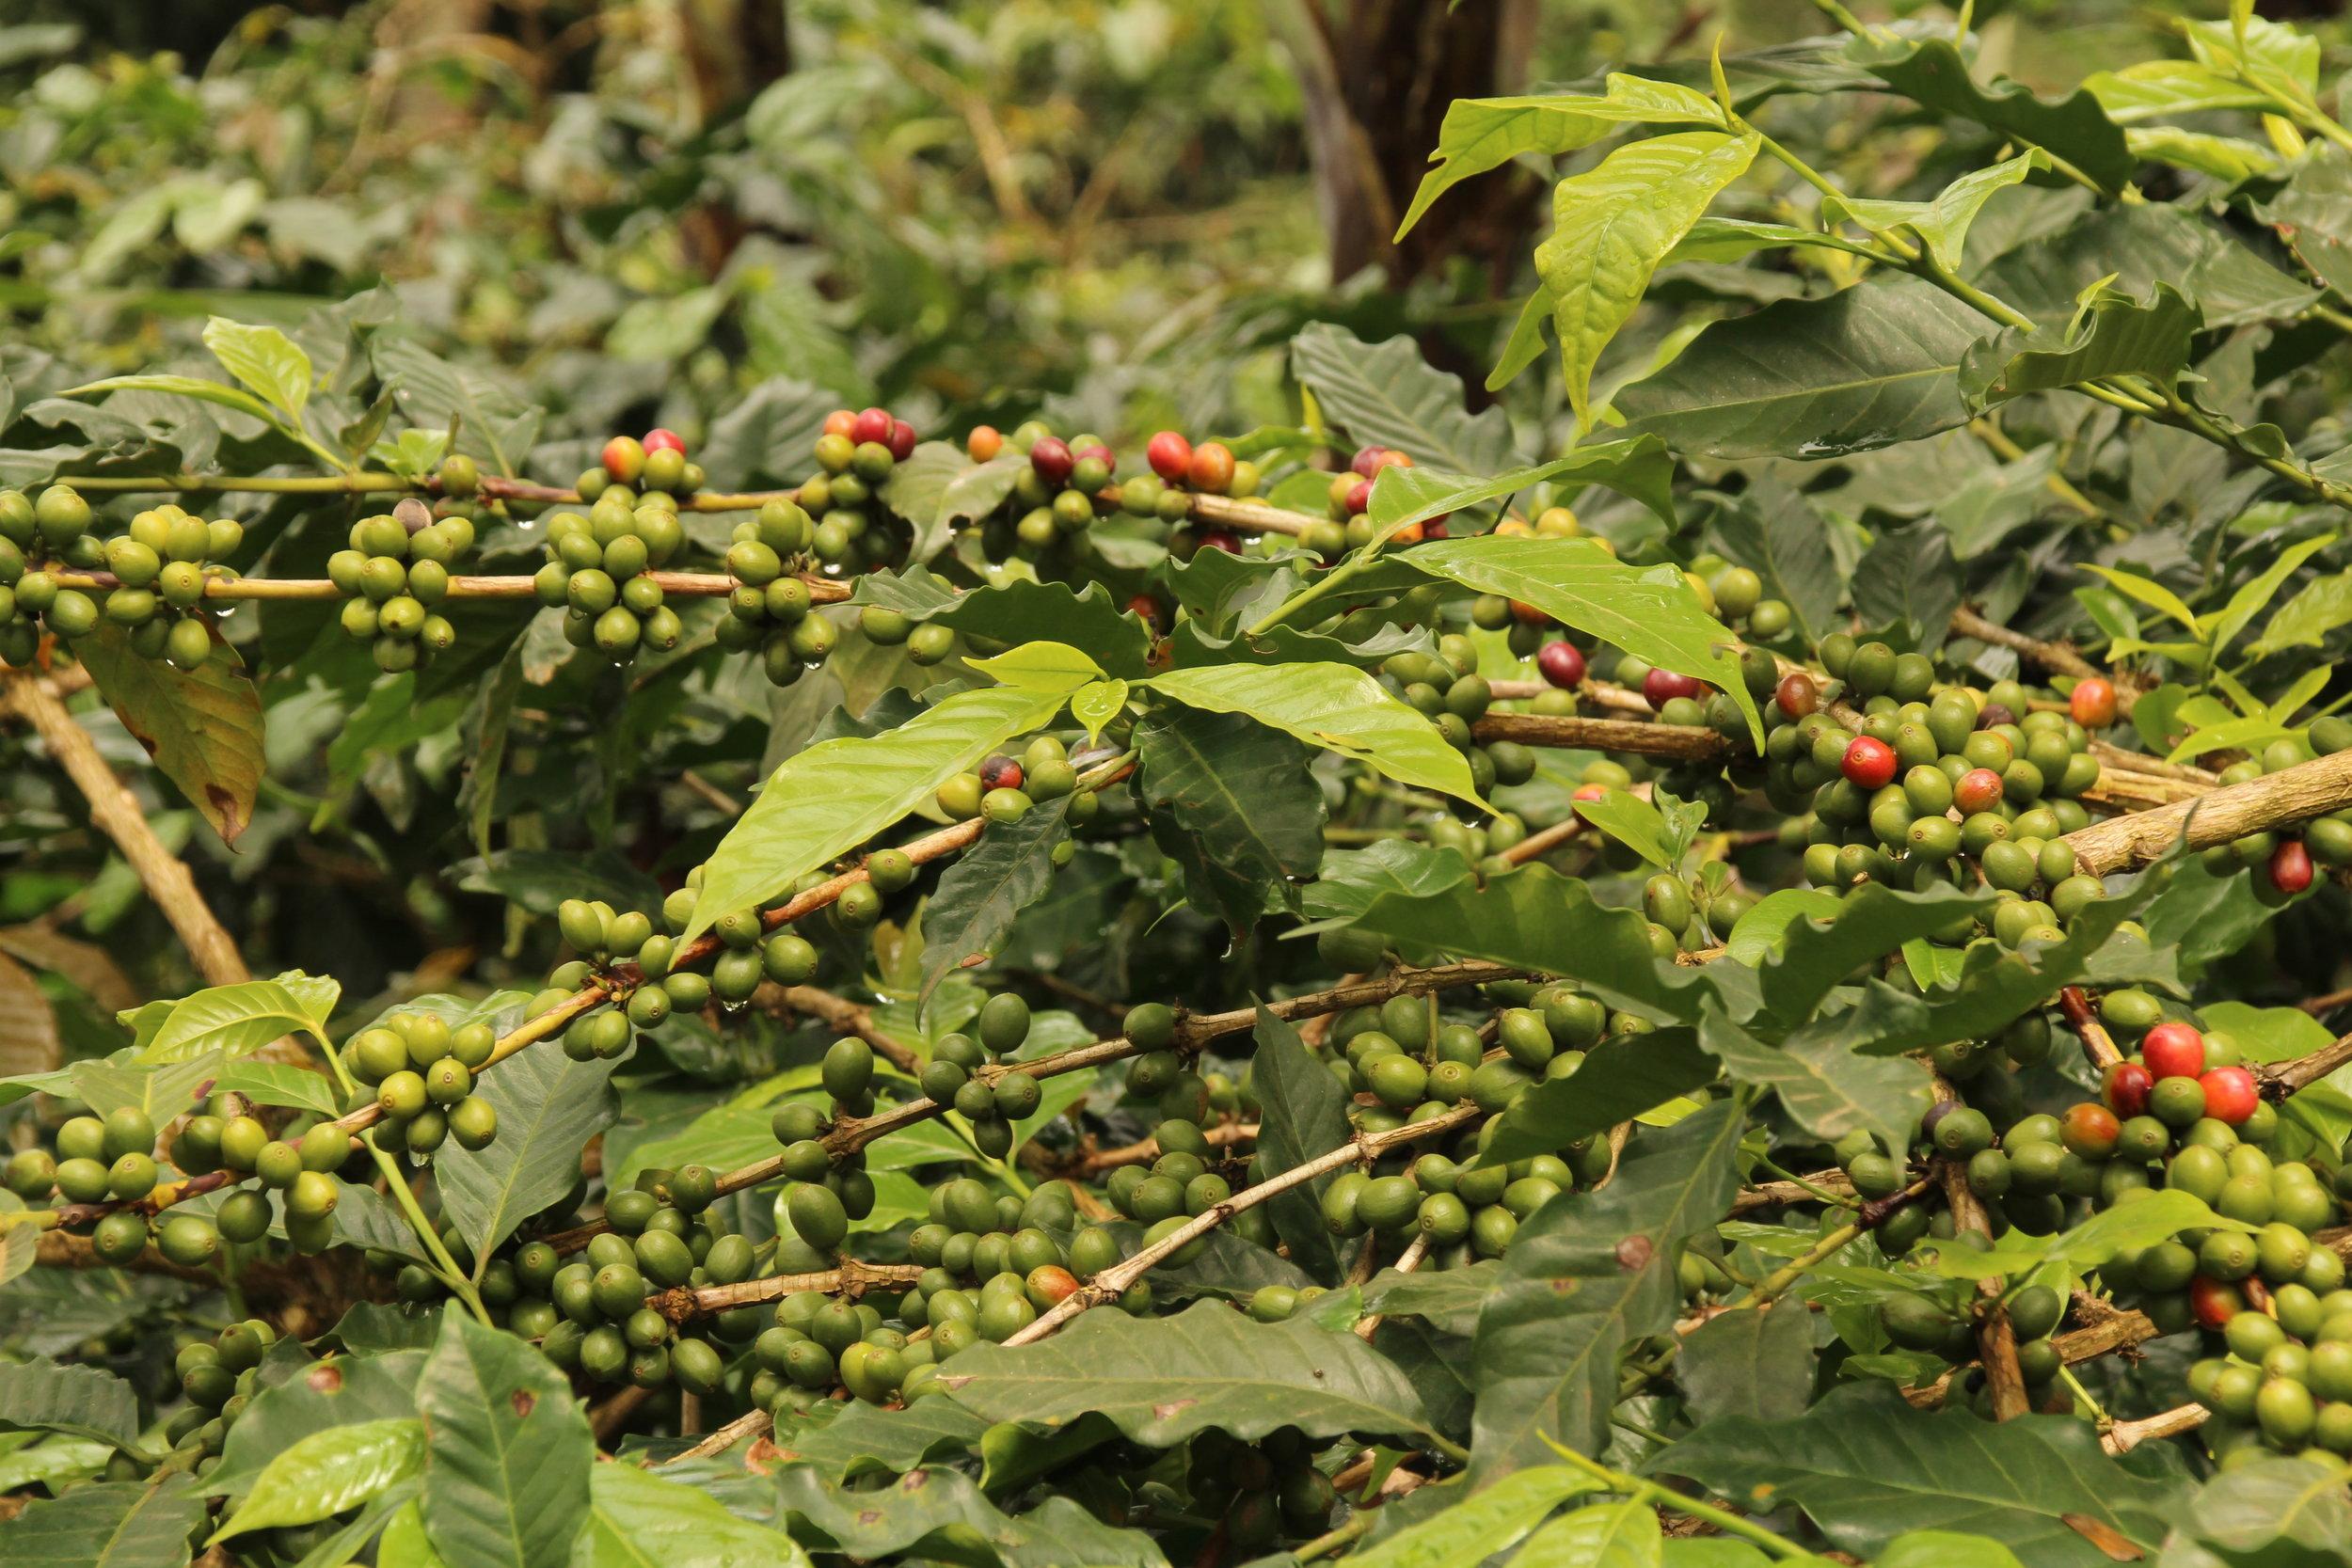 Coffee beans, Uganda 2017